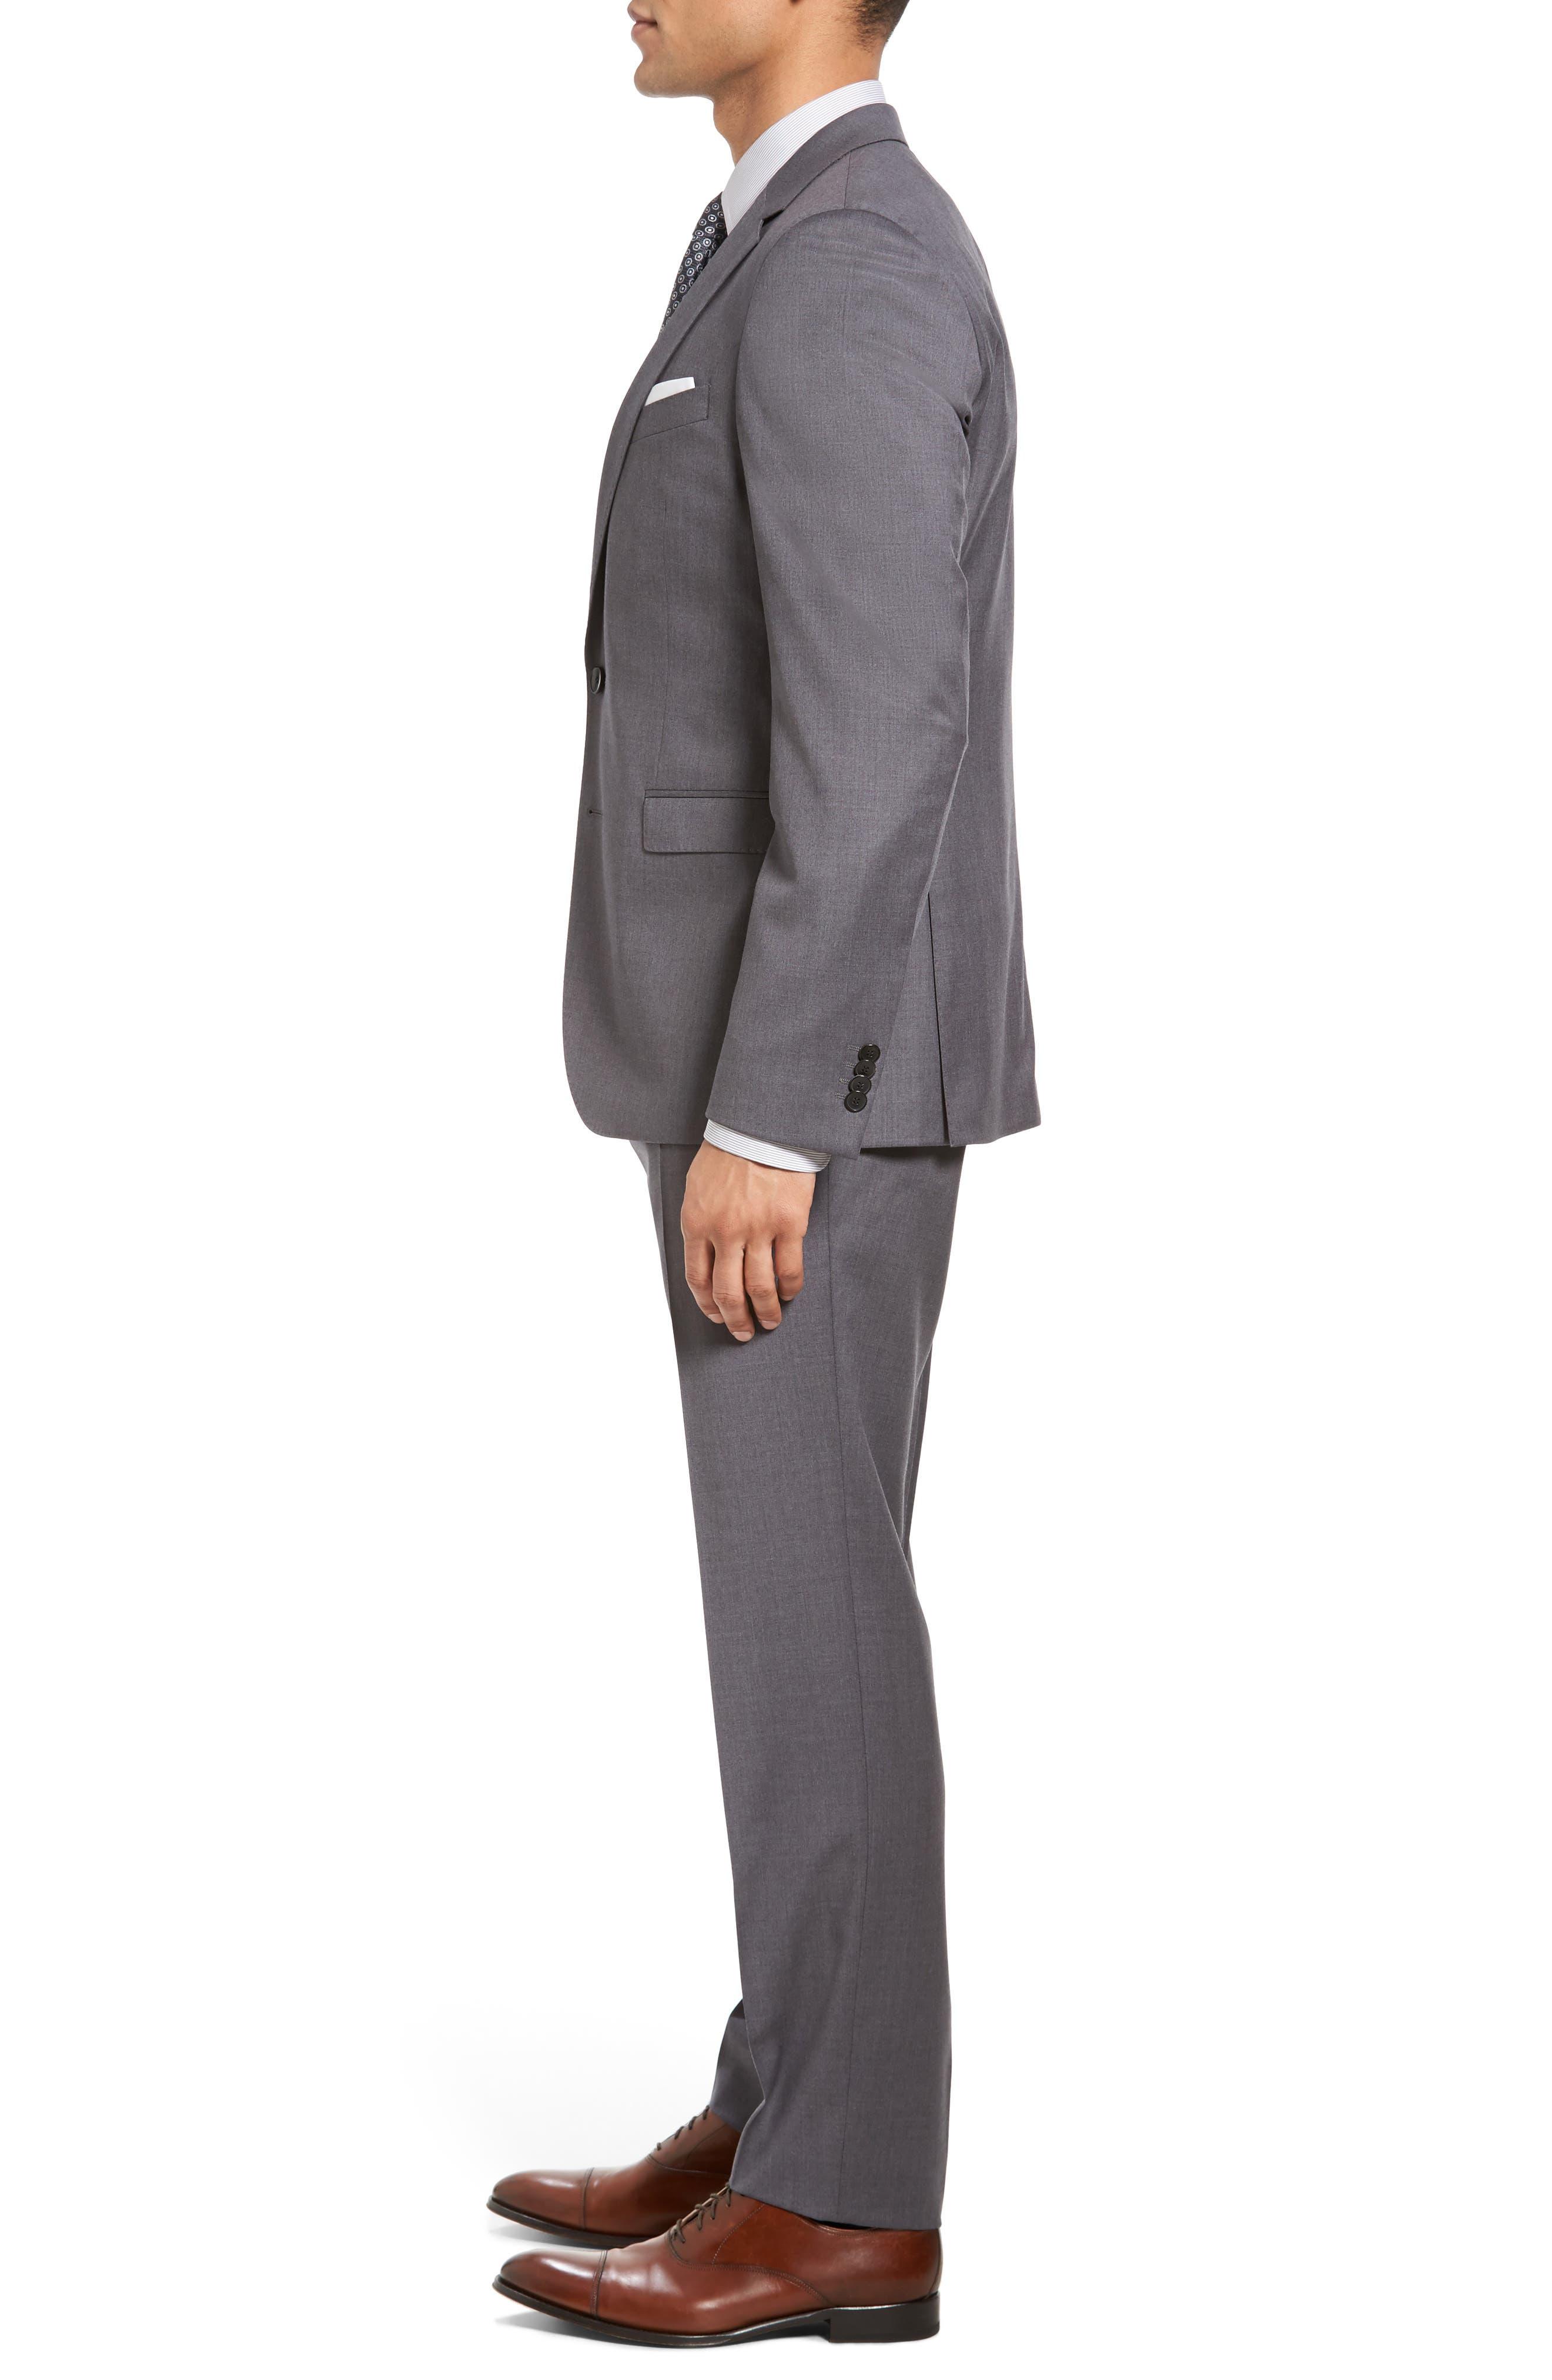 Ryan/Win Trim Fit Solid Wool Suit,                             Alternate thumbnail 4, color,                             Medium Grey